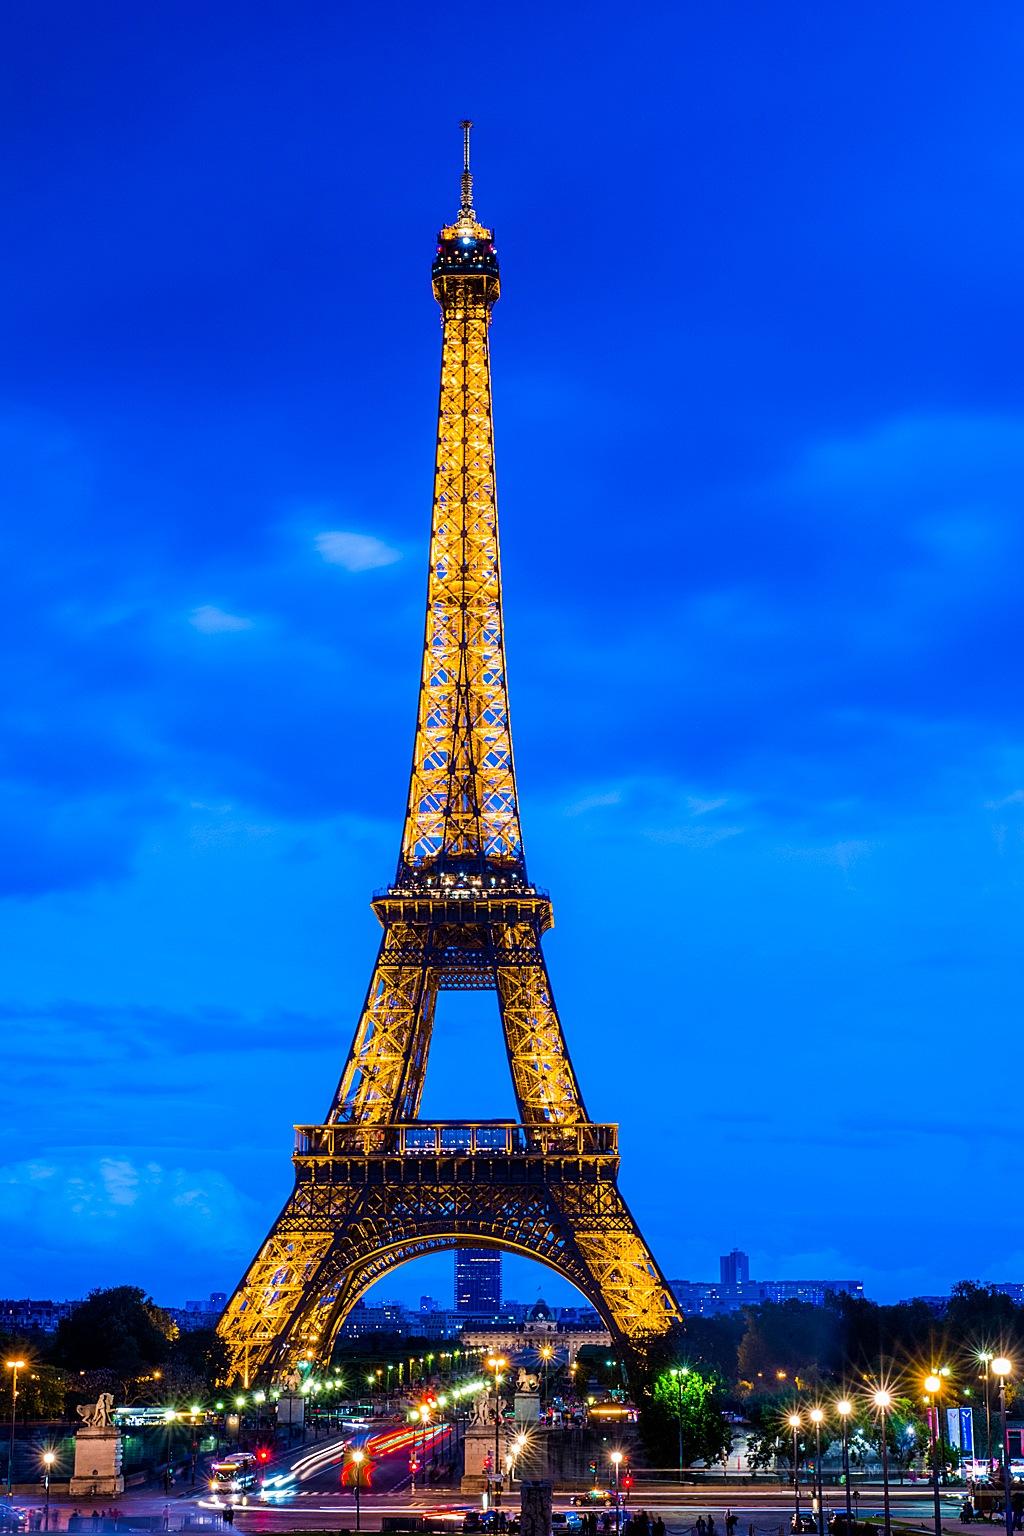 Paris @ Night by manulauret